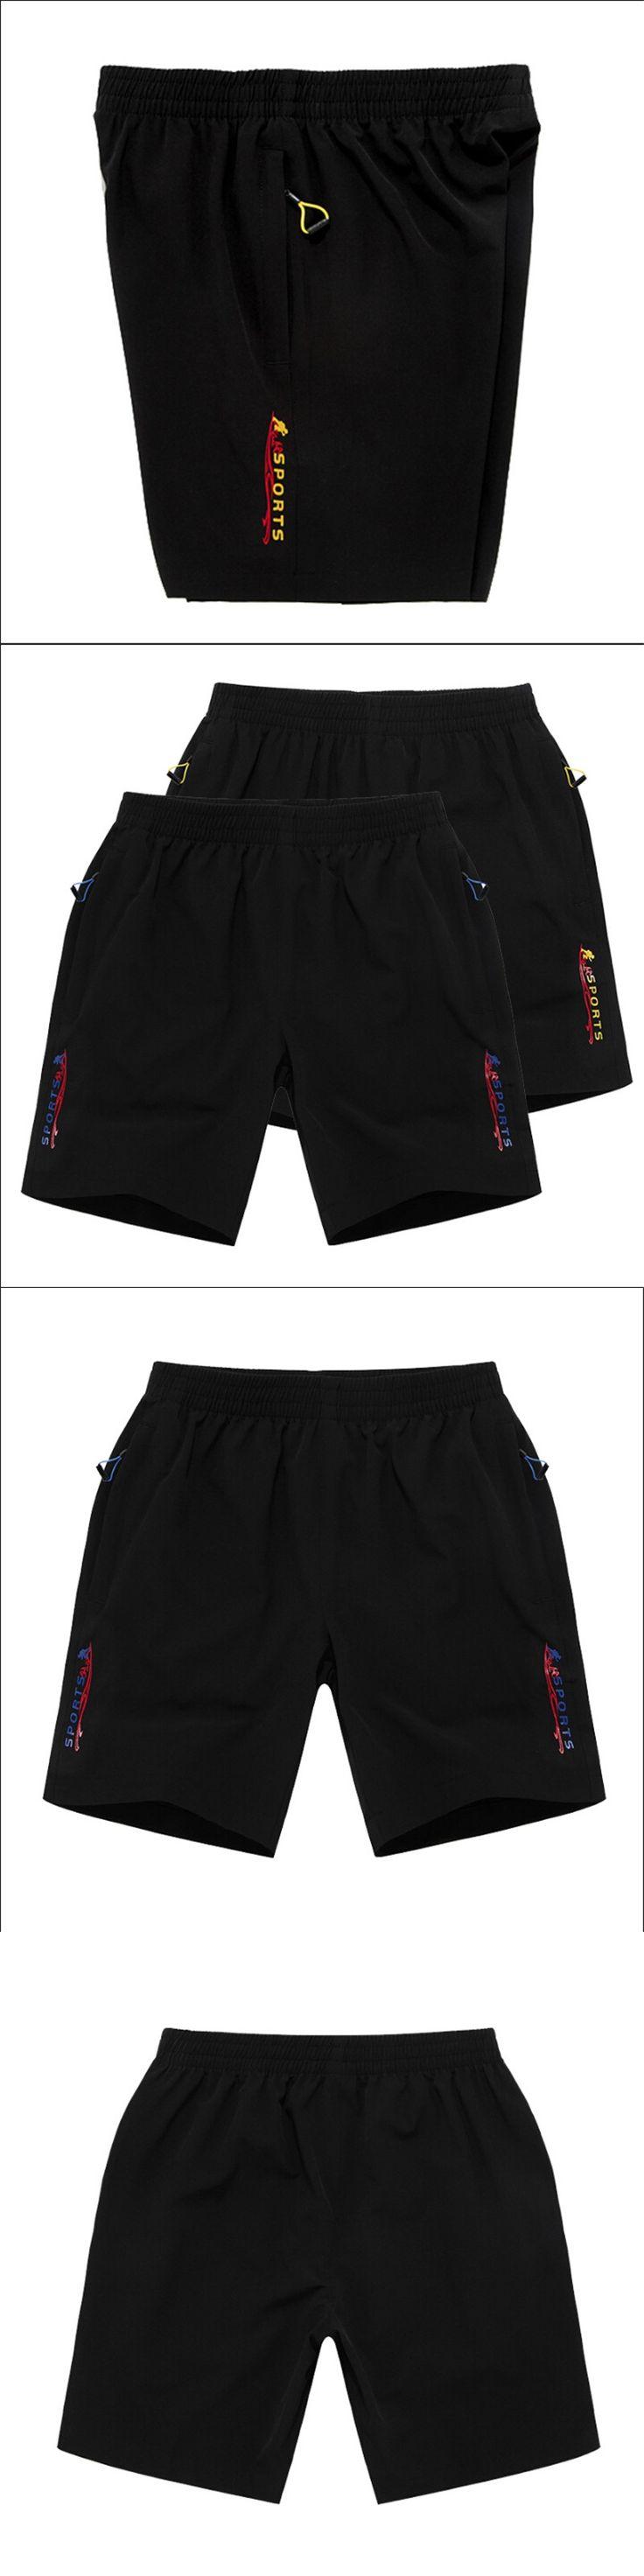 Man Summer Casual Shorts Black Elastic Waist Male Holiday Beach Wear Shorts Good Quality Man Brand Clothing W91176